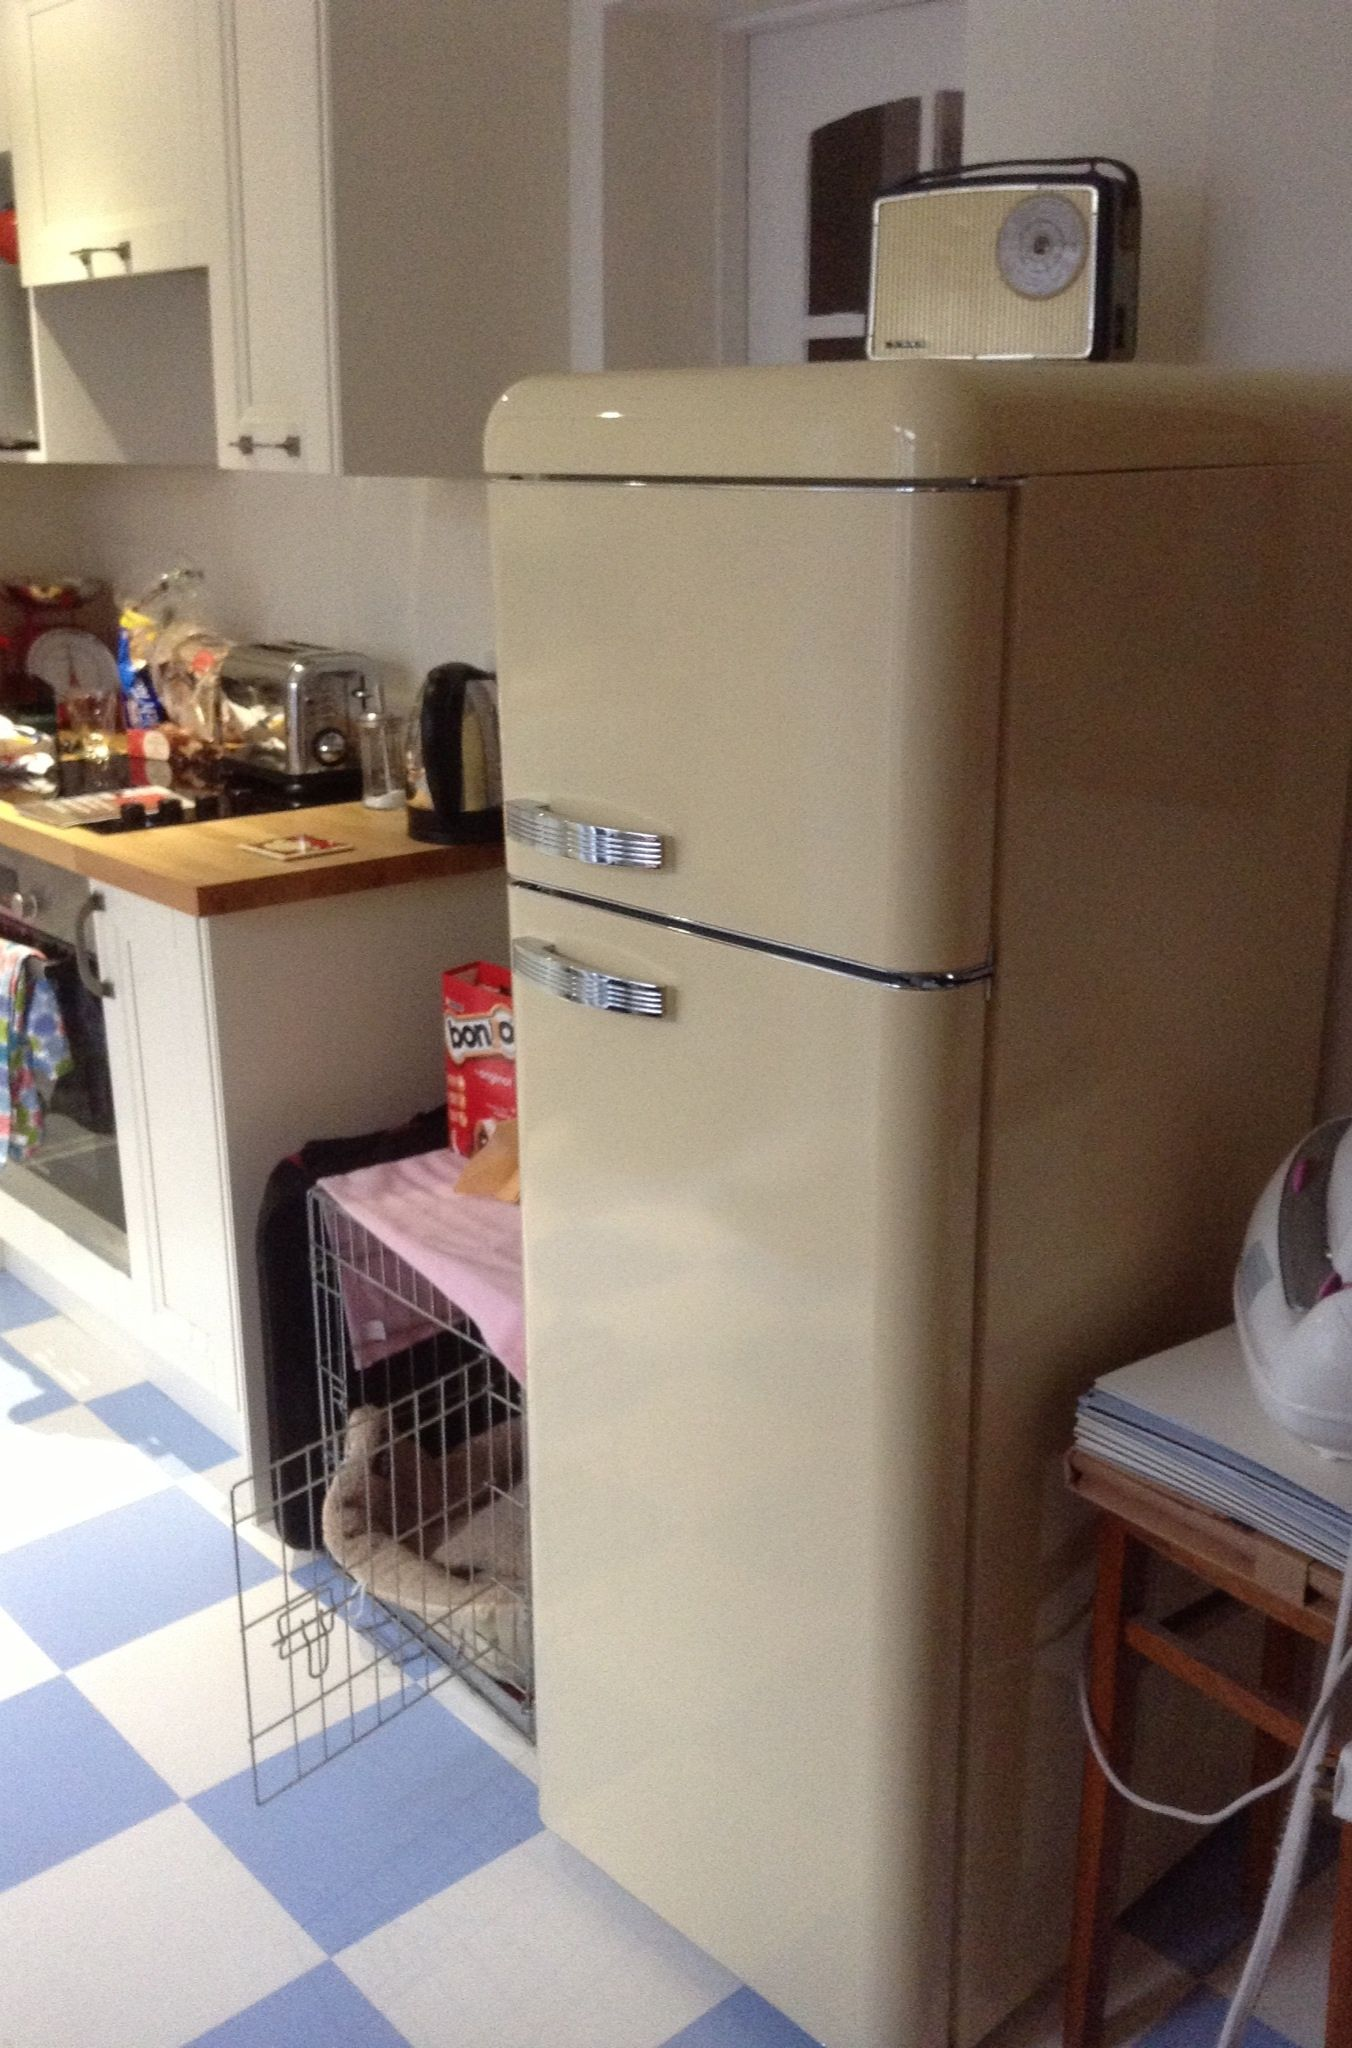 Uncategorized Bush Kitchen Appliances classic cream 50s style retro fridge home sweet swan freezer